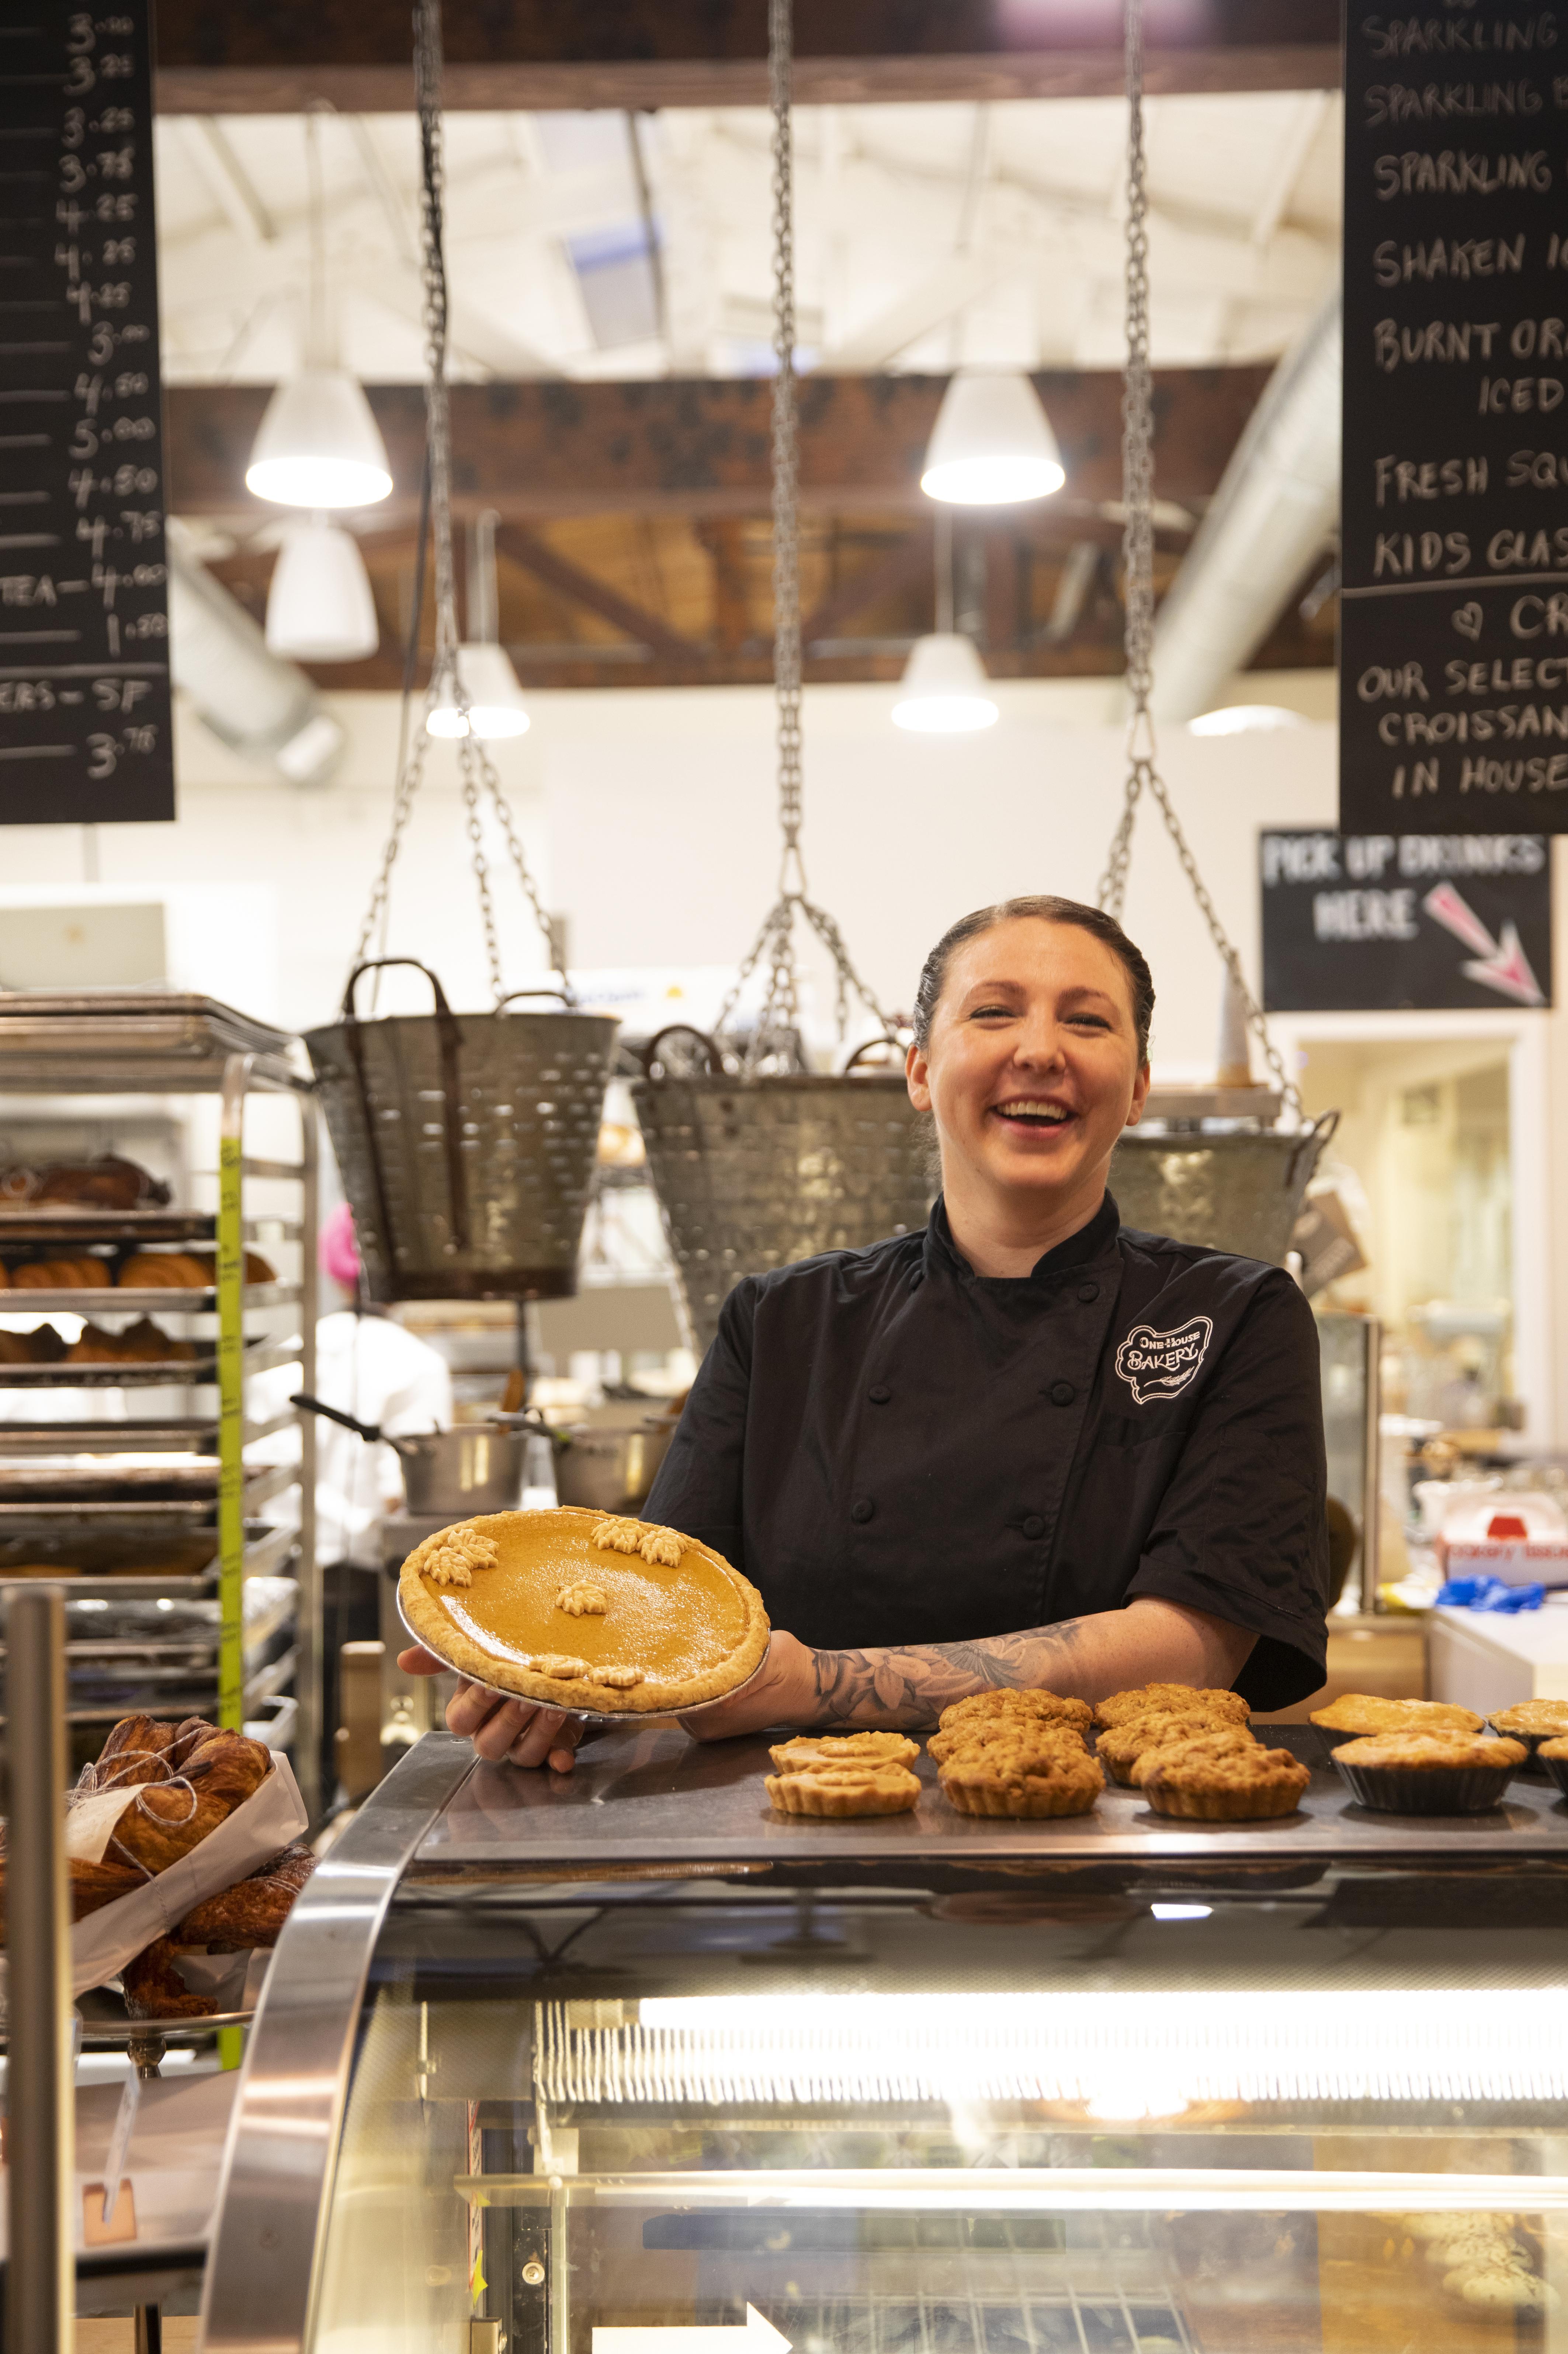 Benicia Bakeries: Perfect Pies & Pastries